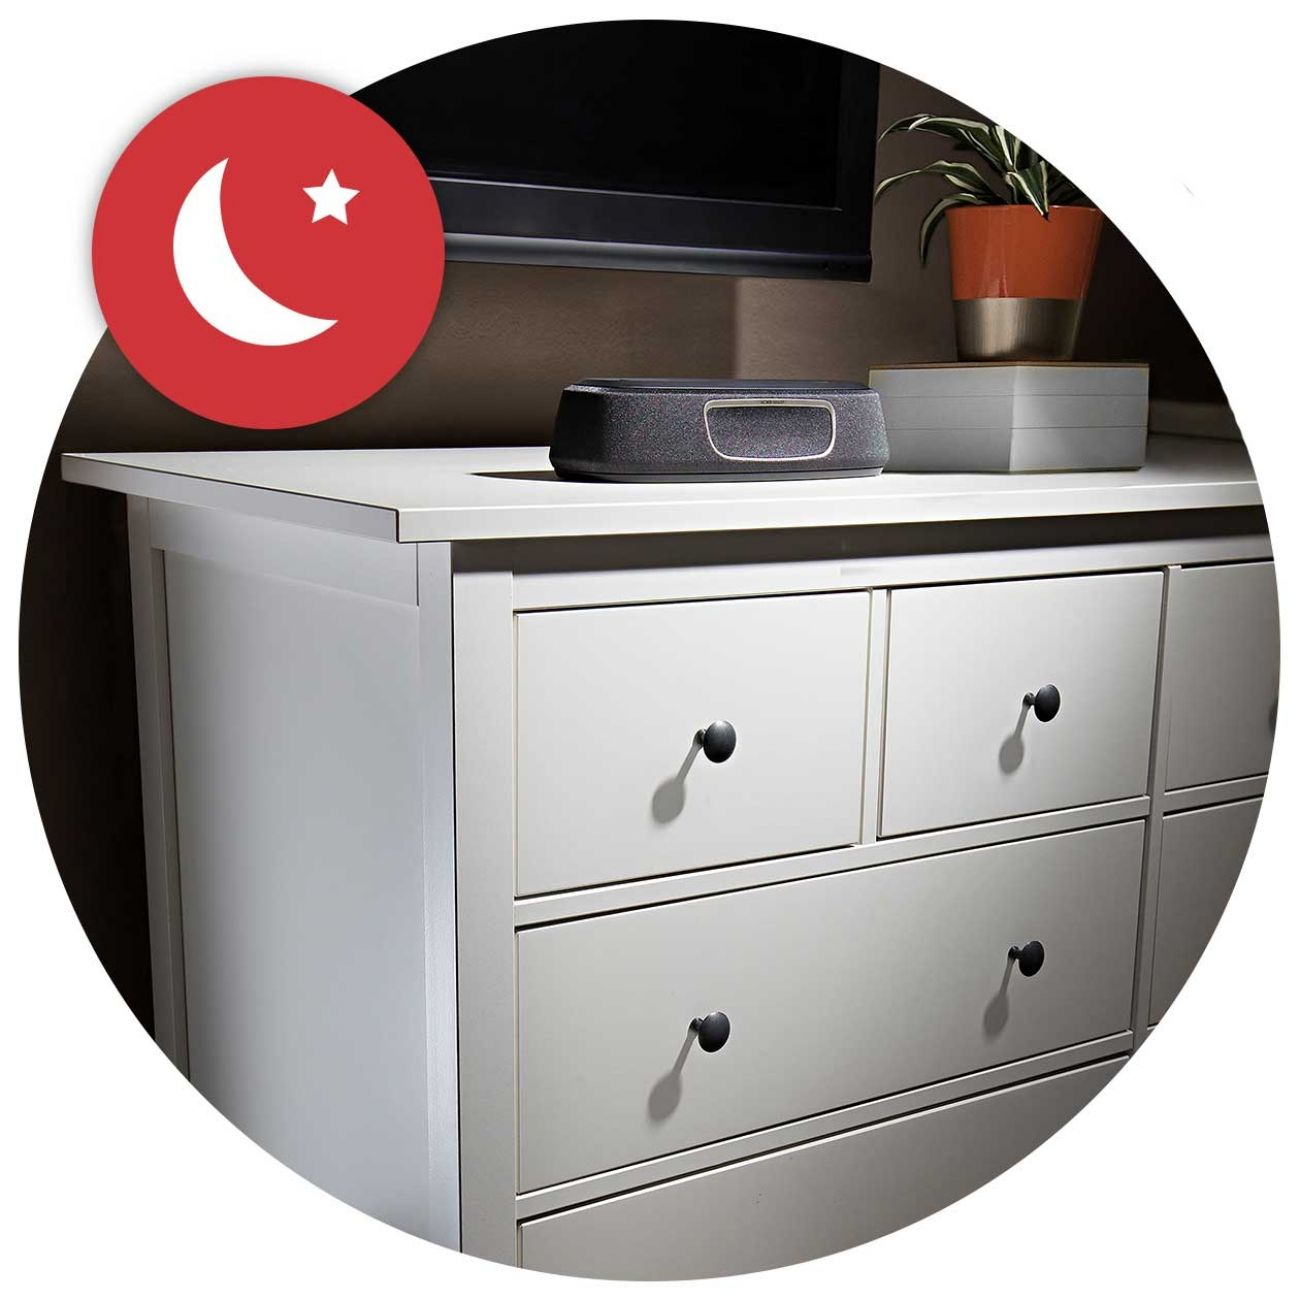 barre de son polk magnifi mini. Black Bedroom Furniture Sets. Home Design Ideas